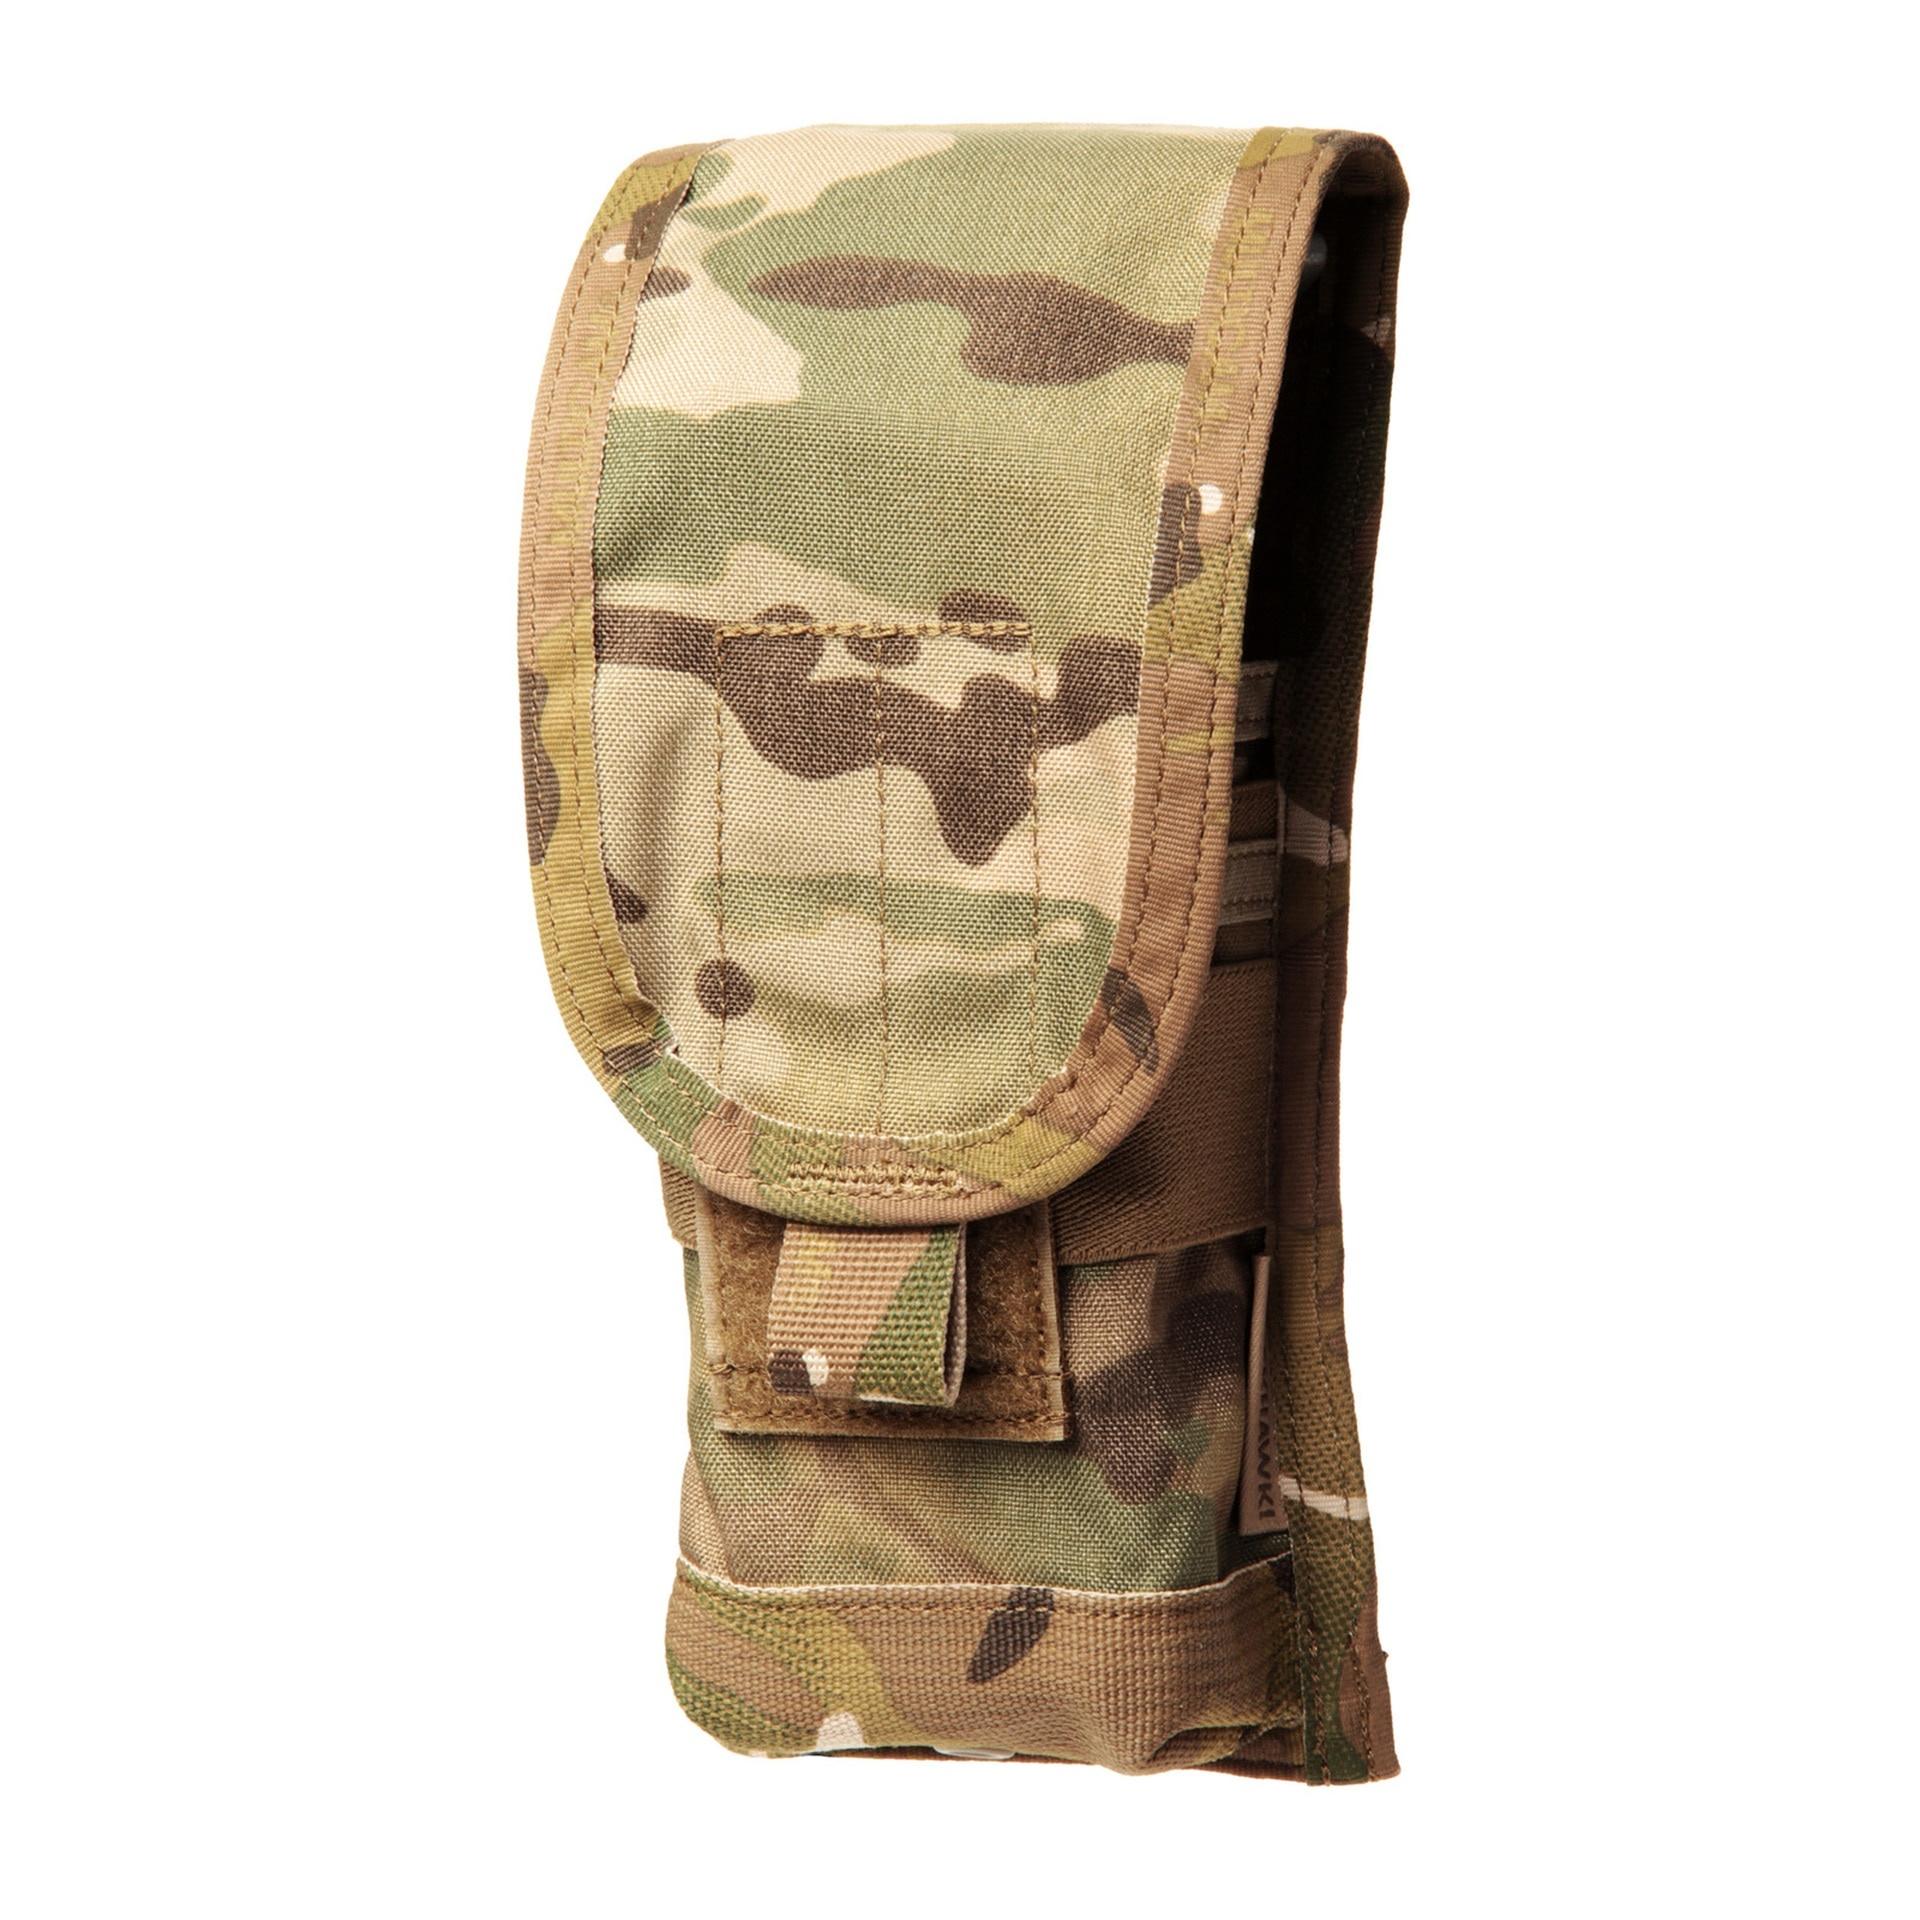 Blackhawk Blackhawk STRIKE M4/M16 Staggered Mag Pouch